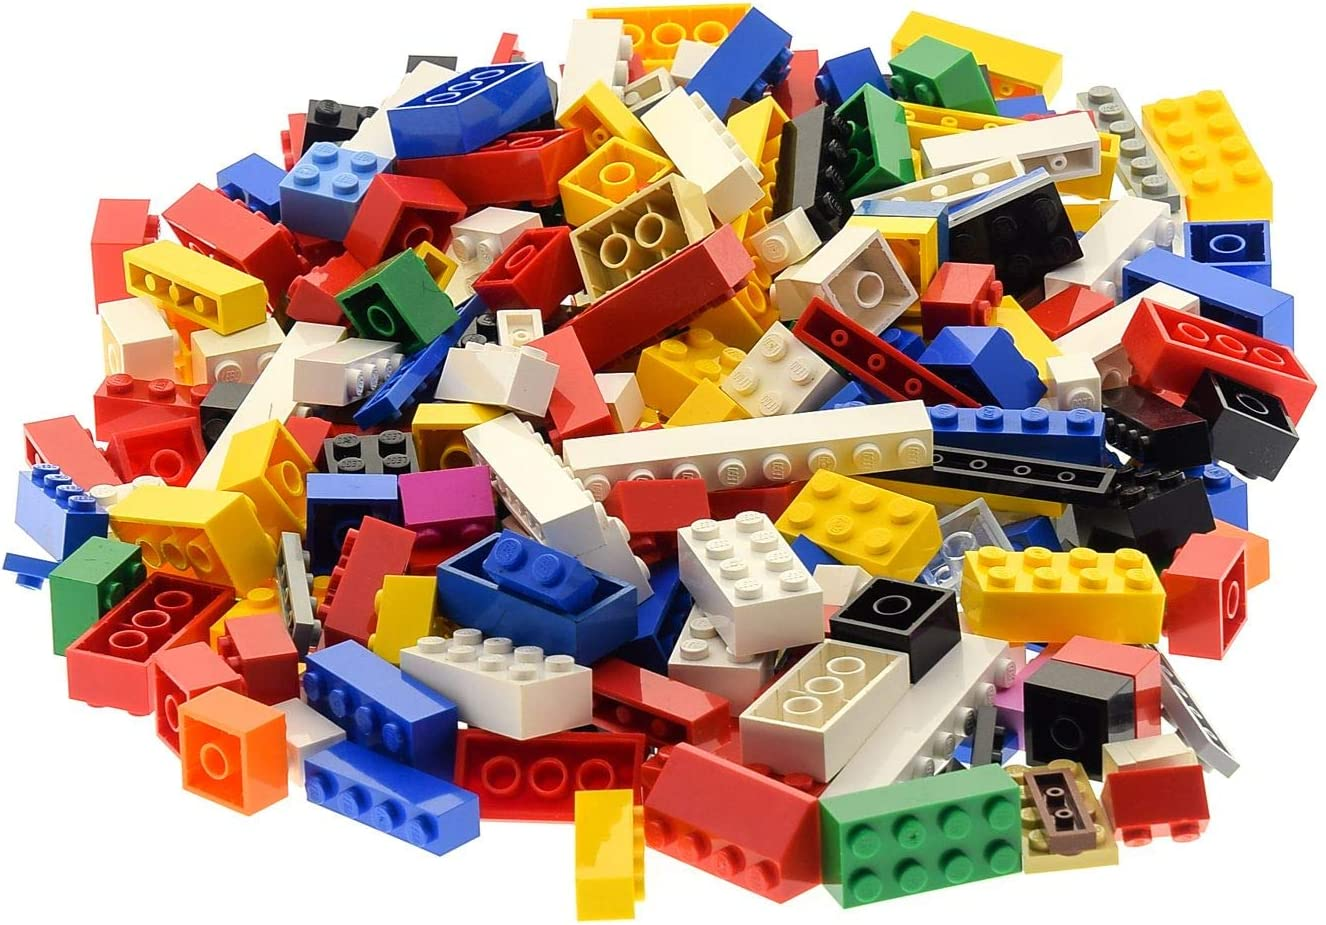 10-20 - 50-100 - 200 Stück Lego Basissteine 1x6 blau 3009 neu